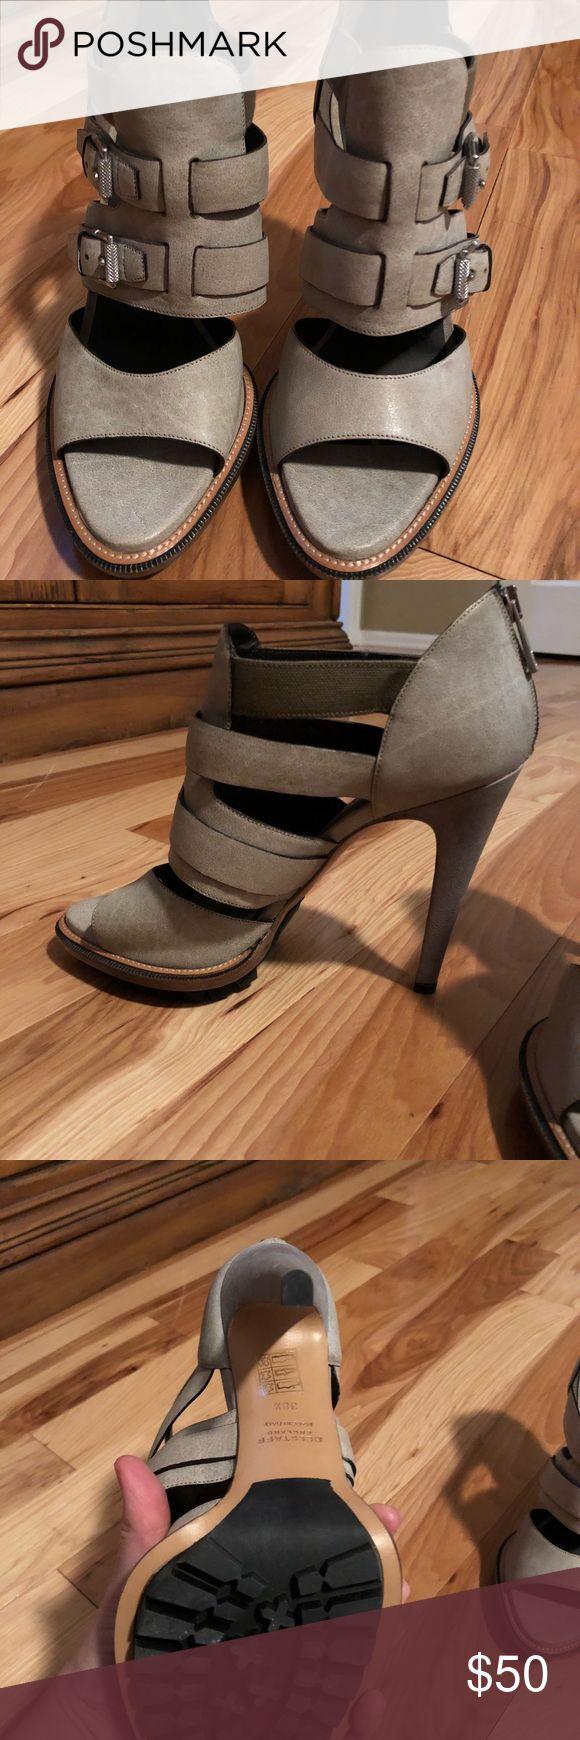 Beautiful Belstaf heels To die for! Never worn. Perfect beige/ taupe color with fantastic buckle detail. Zip-up heel Belstaff Shoes Heels